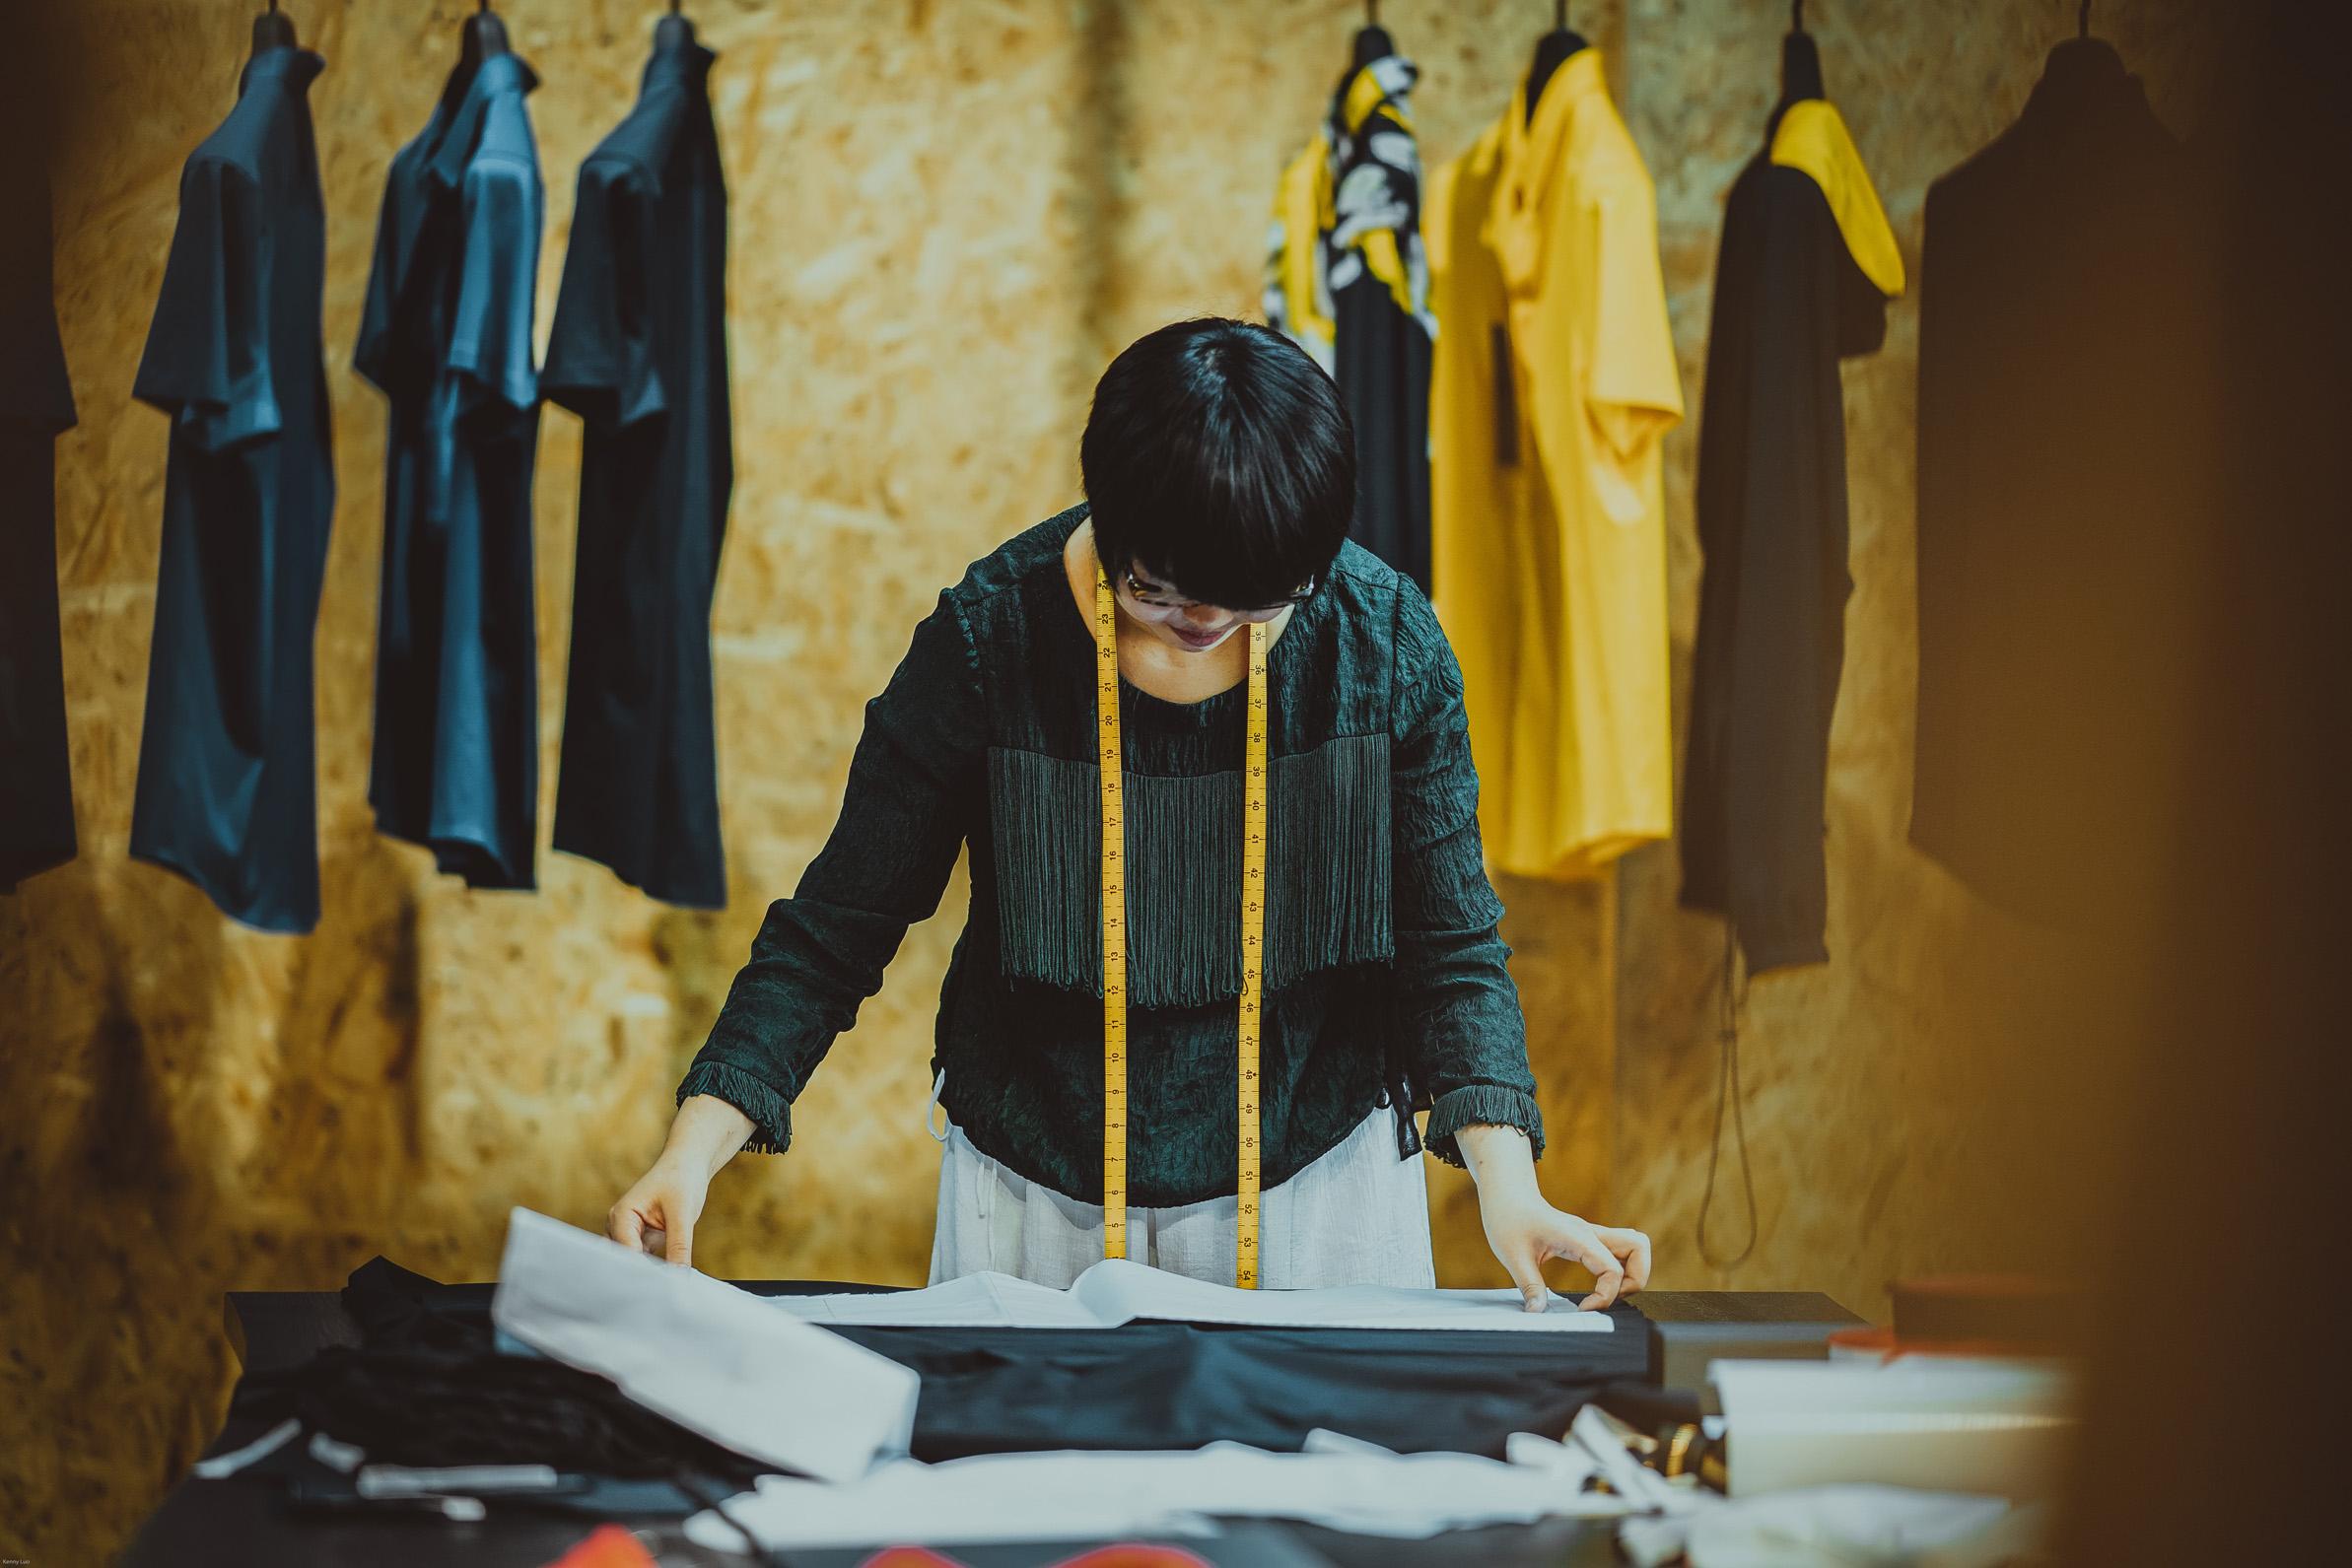 Fábrica de moda en Asia @ocasia.es